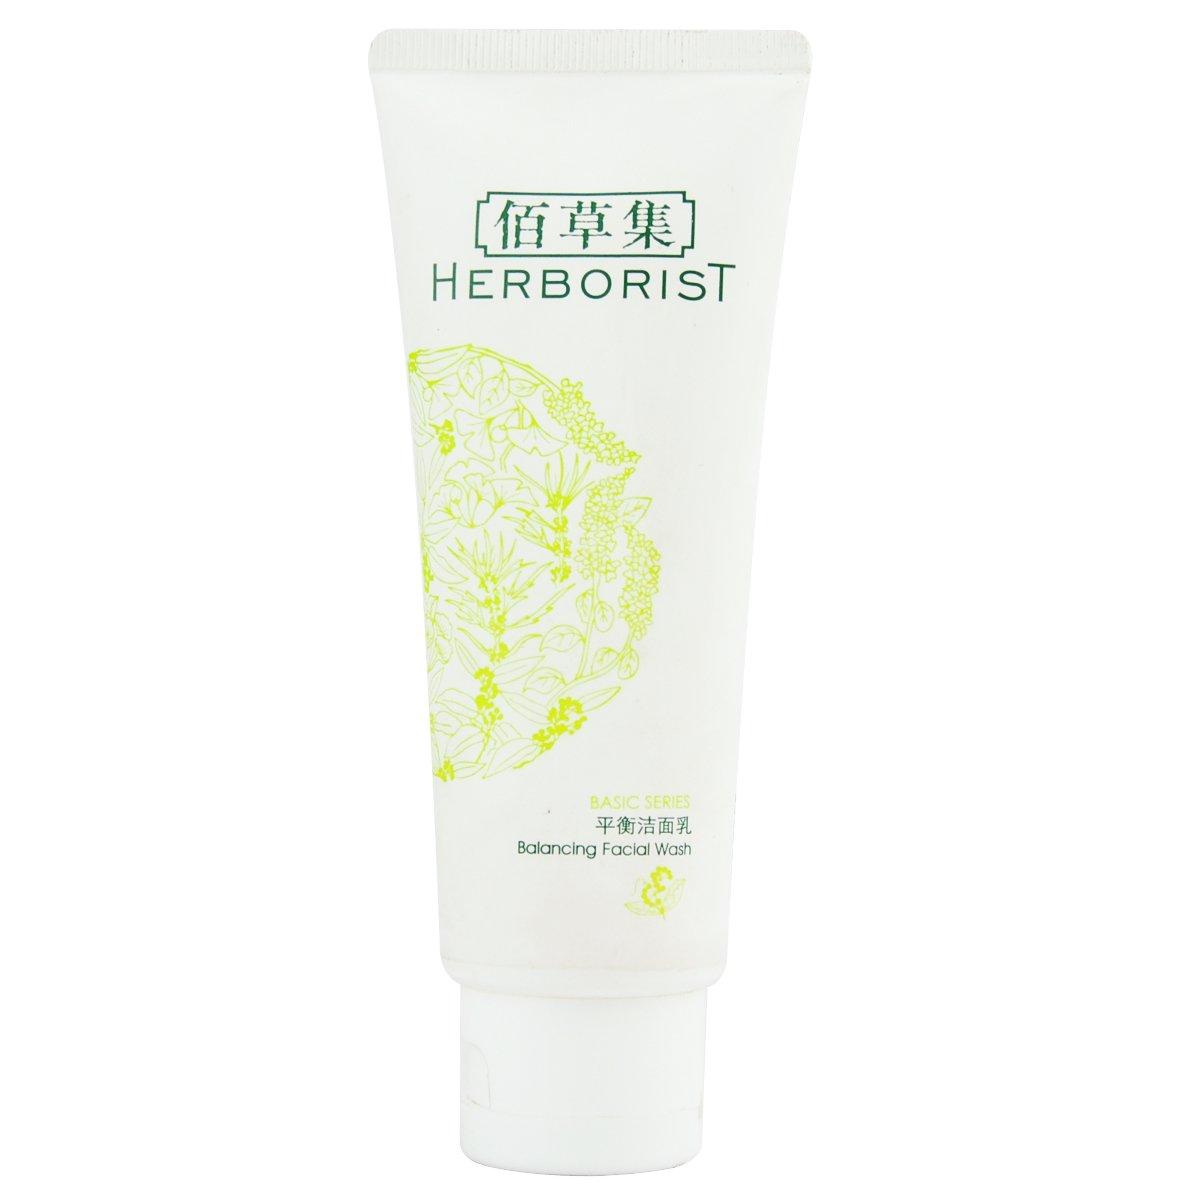 Herborist Balancing Facial Wash (Basic Series) 100ml/3.4oz Eco Lips - Eco Tints Lip Balm Rose Quartz - 0.15 oz. (pack of 12)